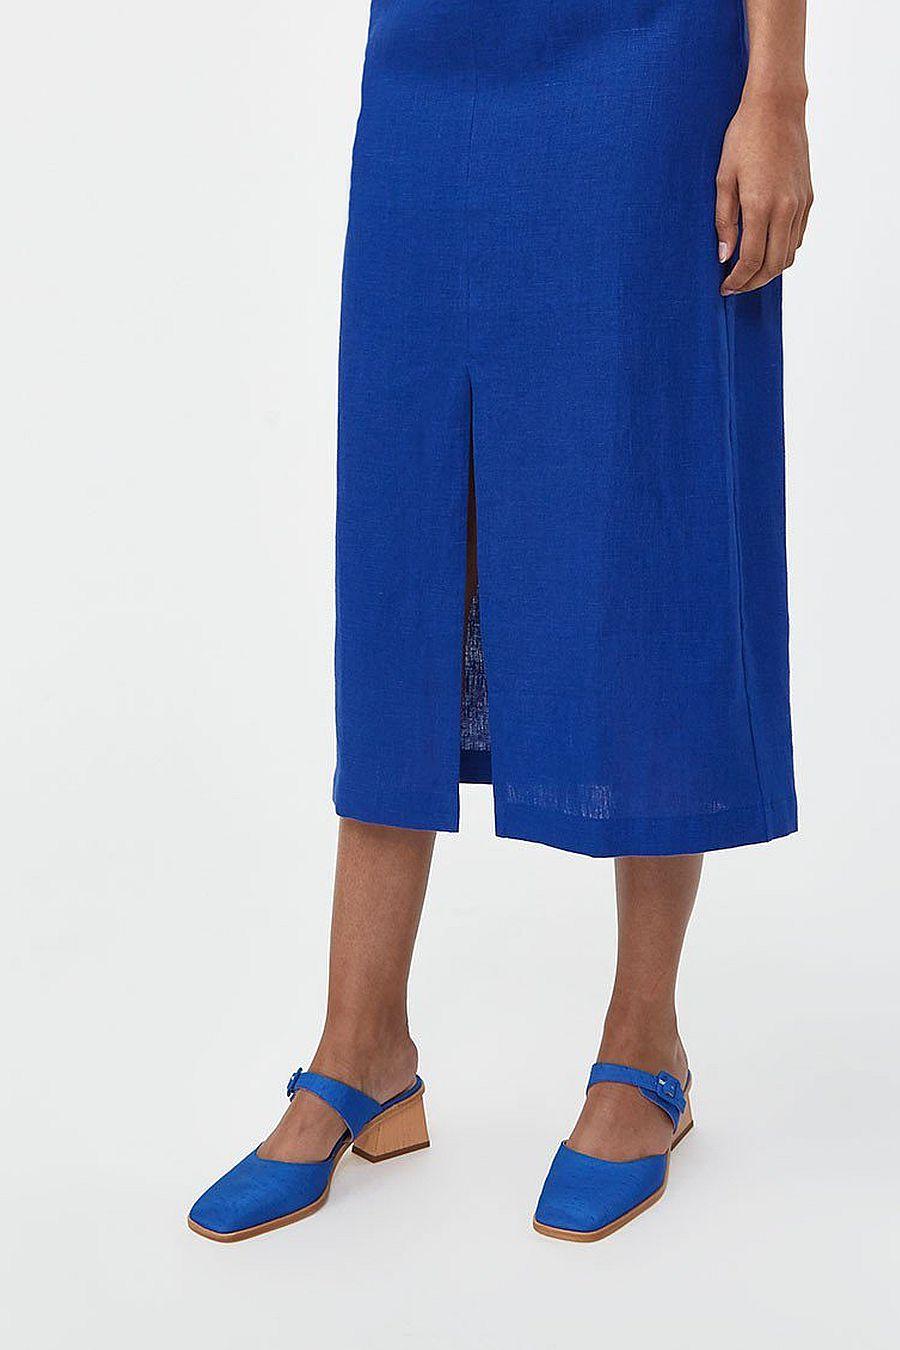 Paloma Wool Museo Dress in Intense Blue